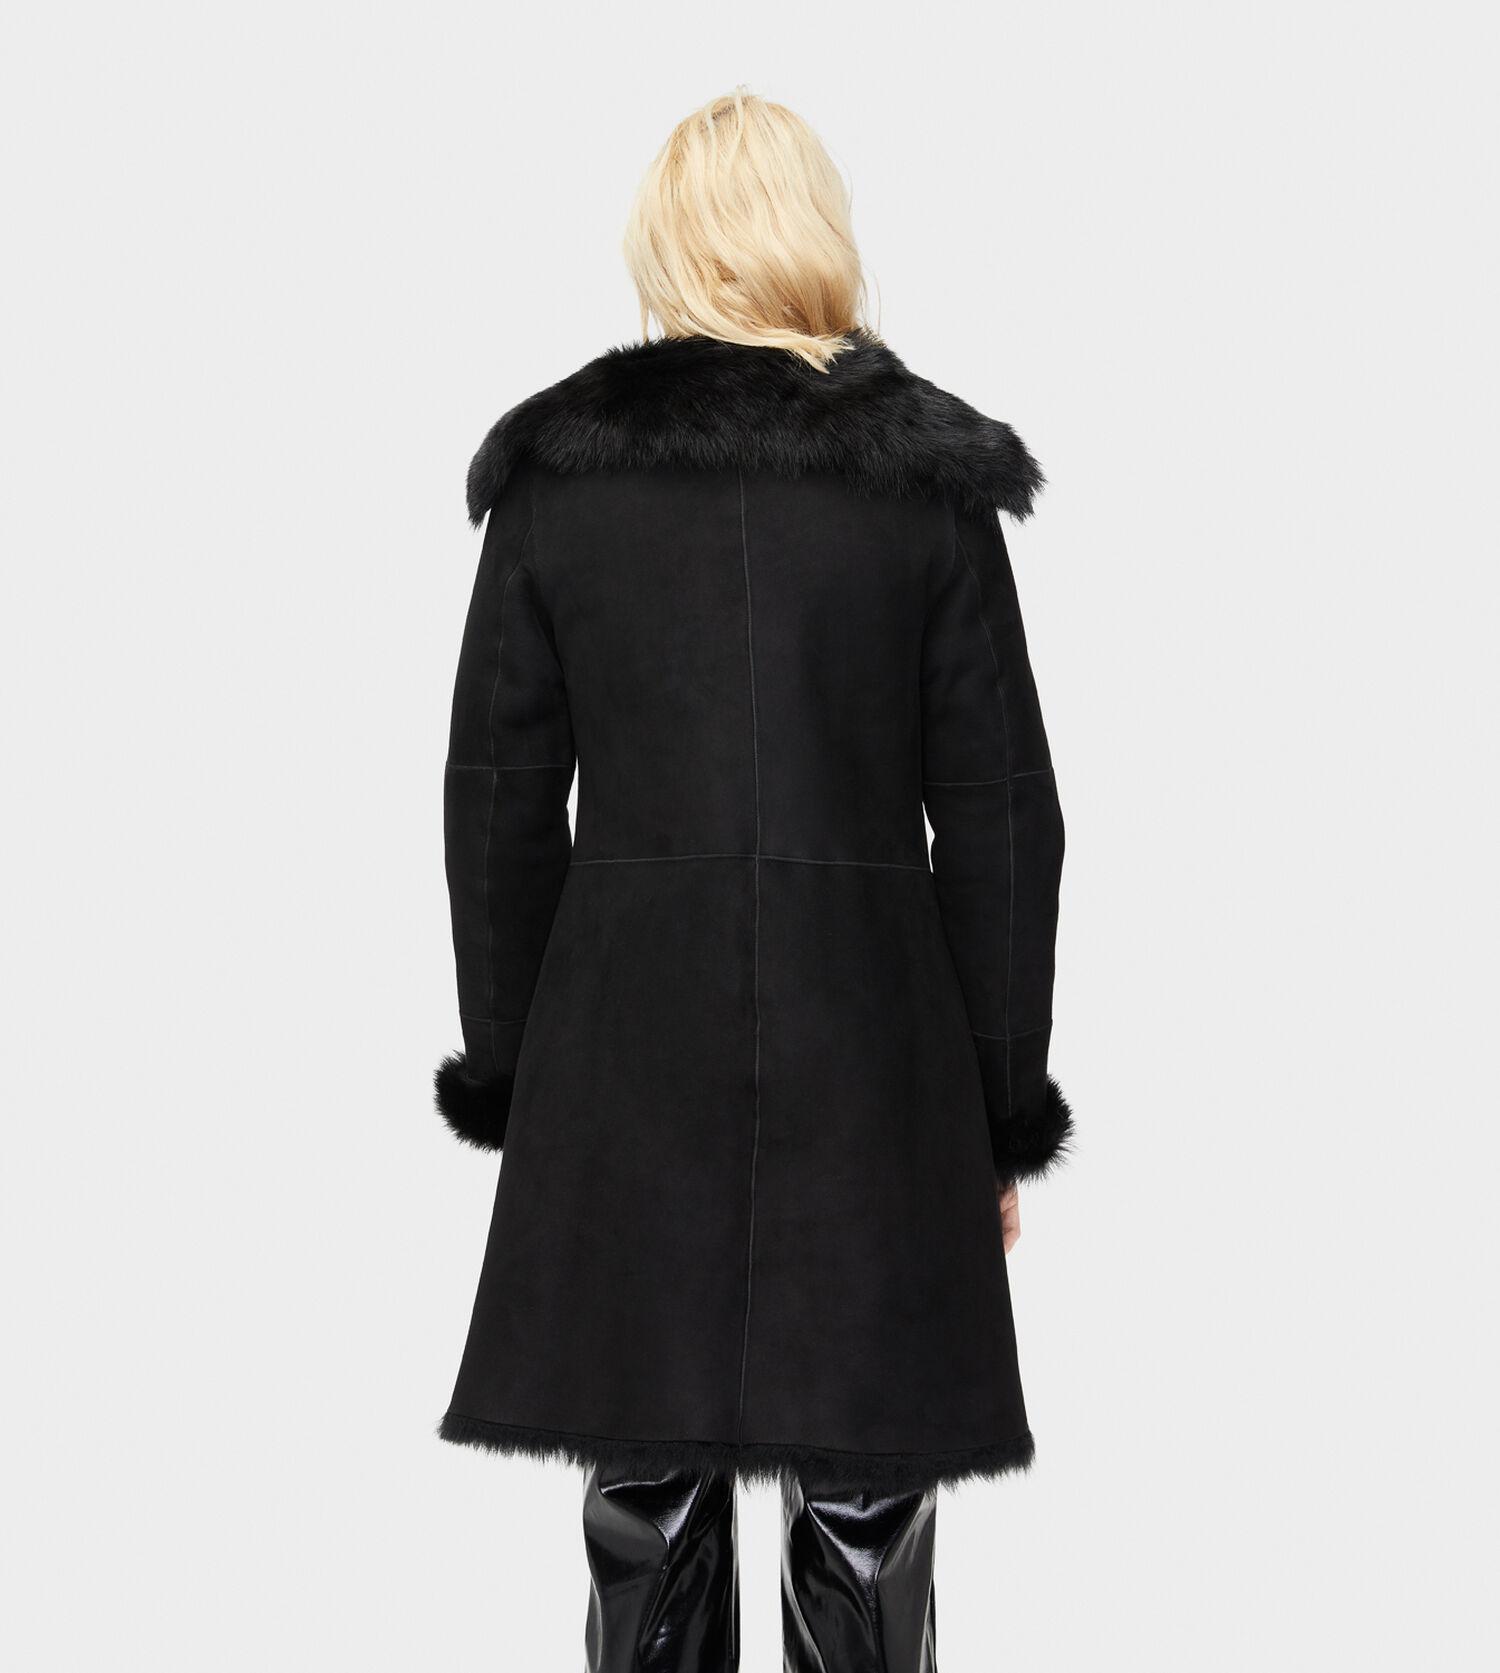 55a5cc2ca Women's Share this product Vanesa Toscana Shearling Coat